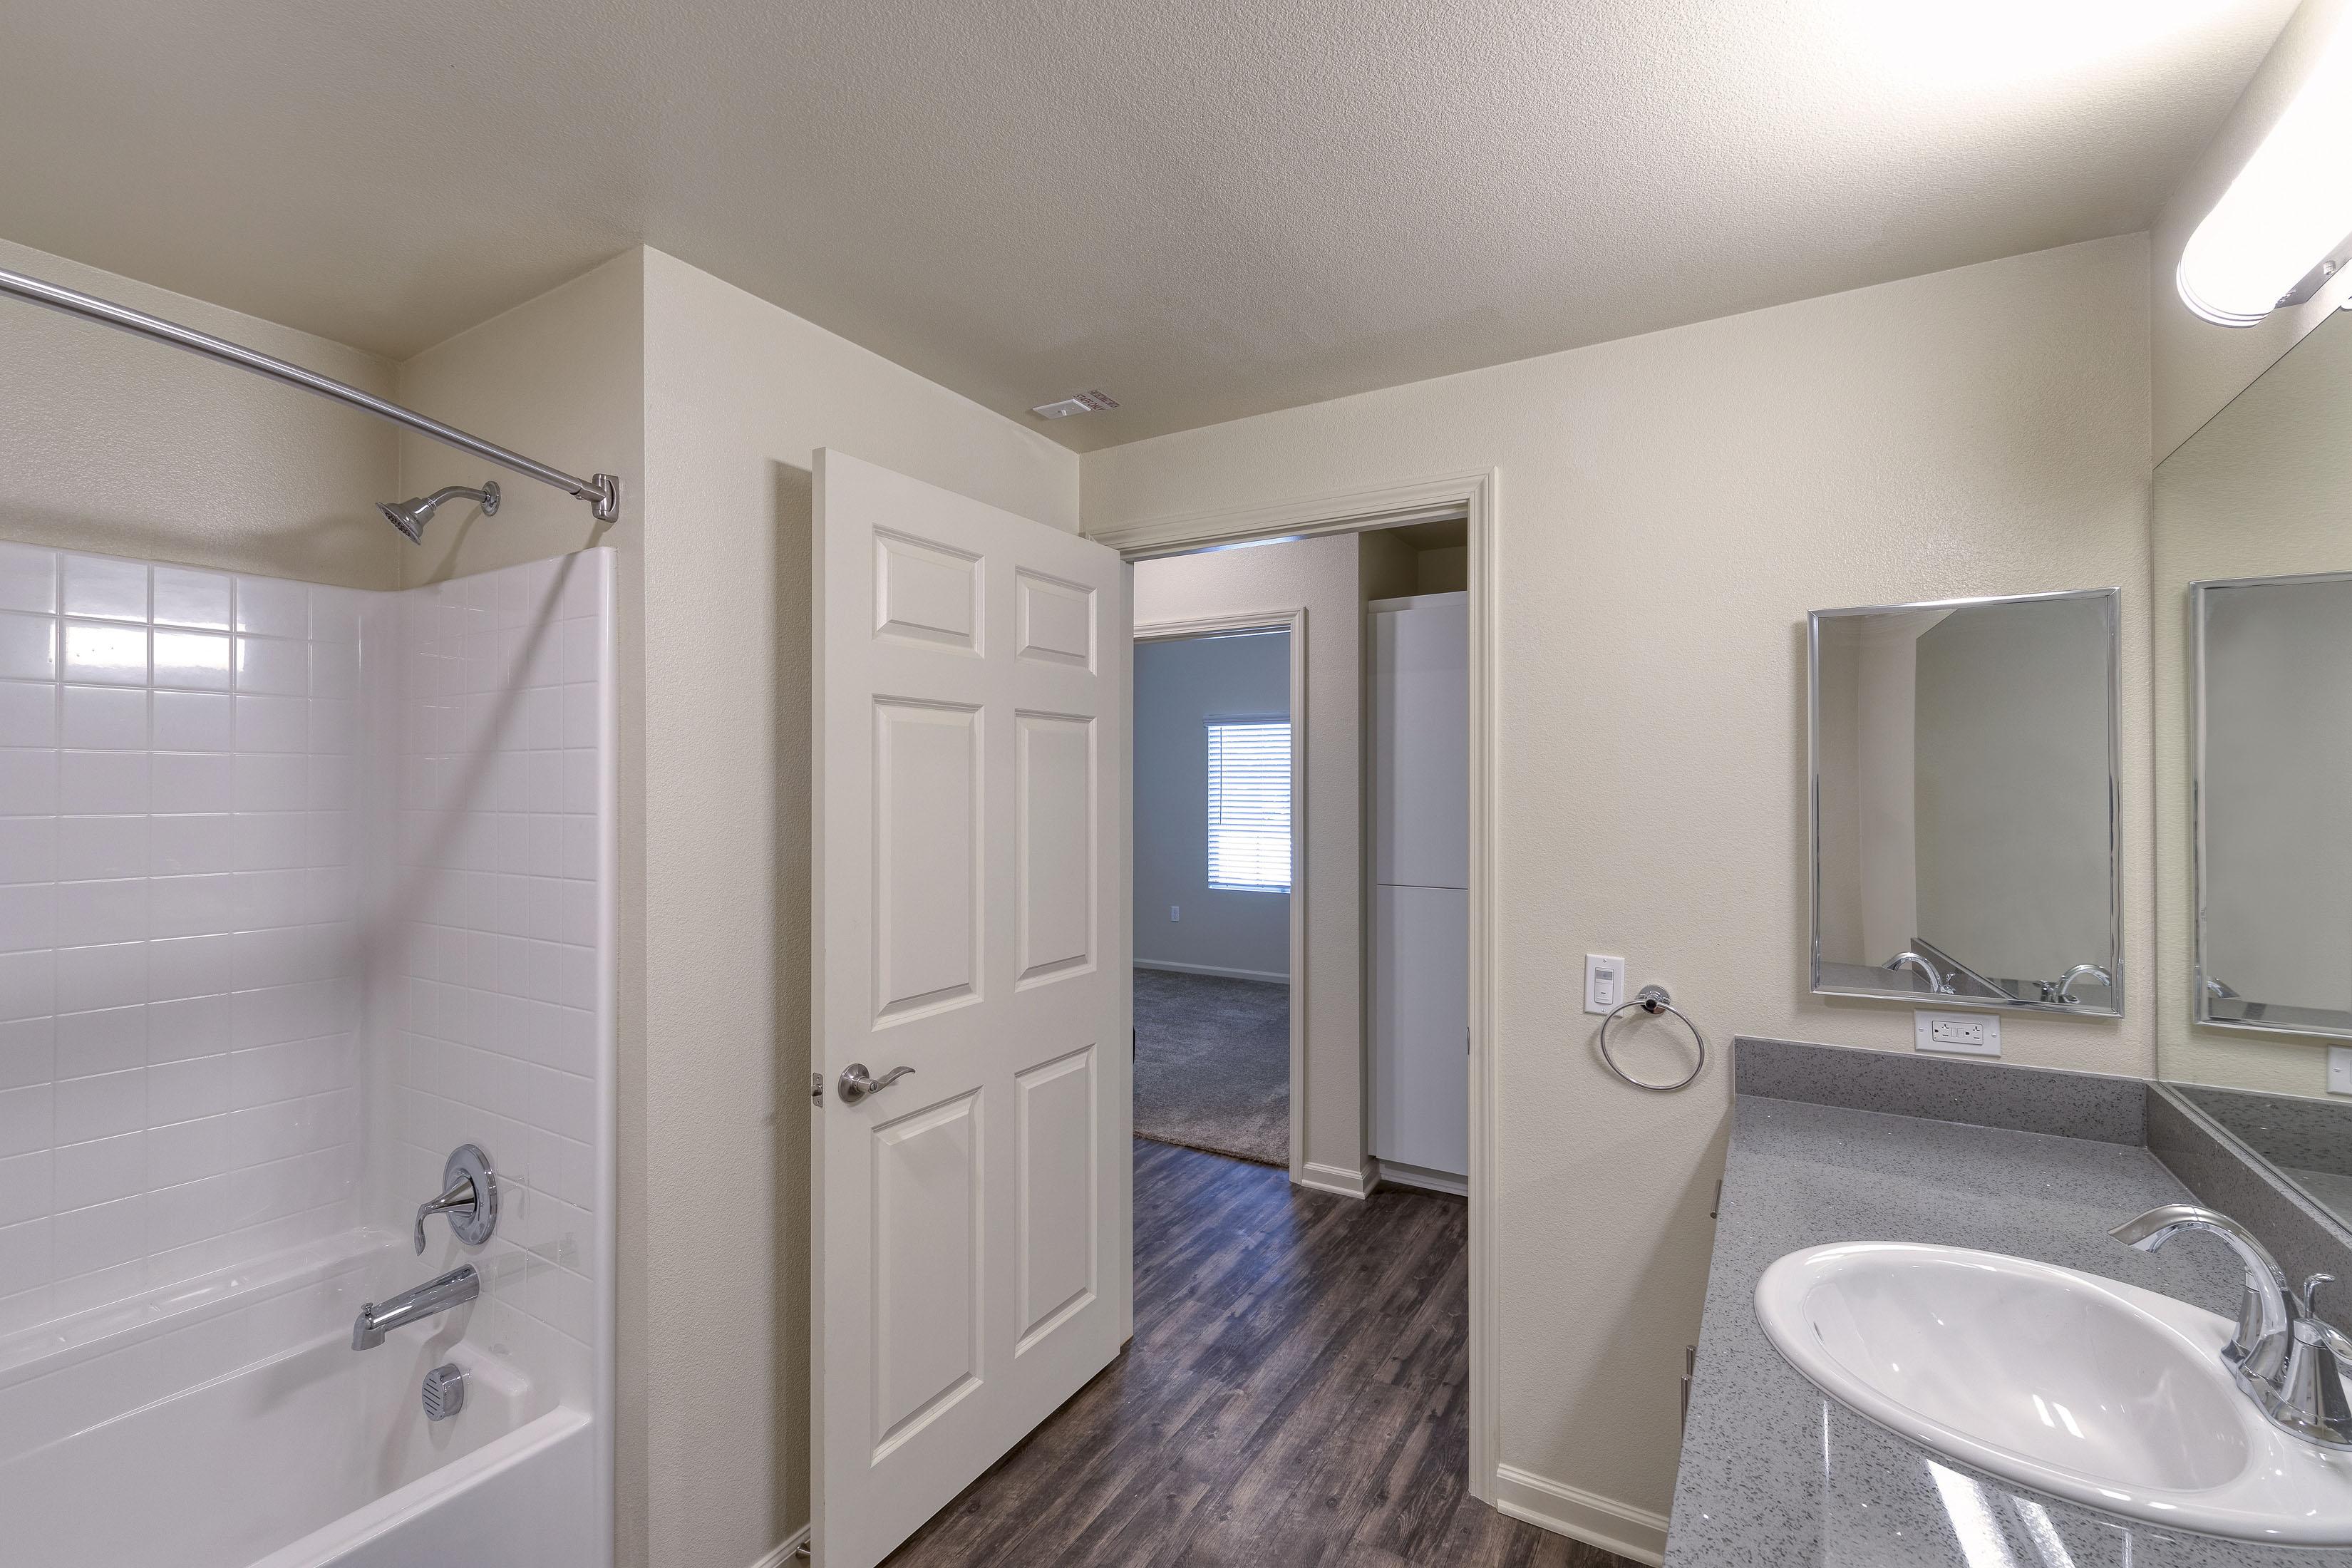 C&C_Unit103_Bathroom2_0054b-11x8